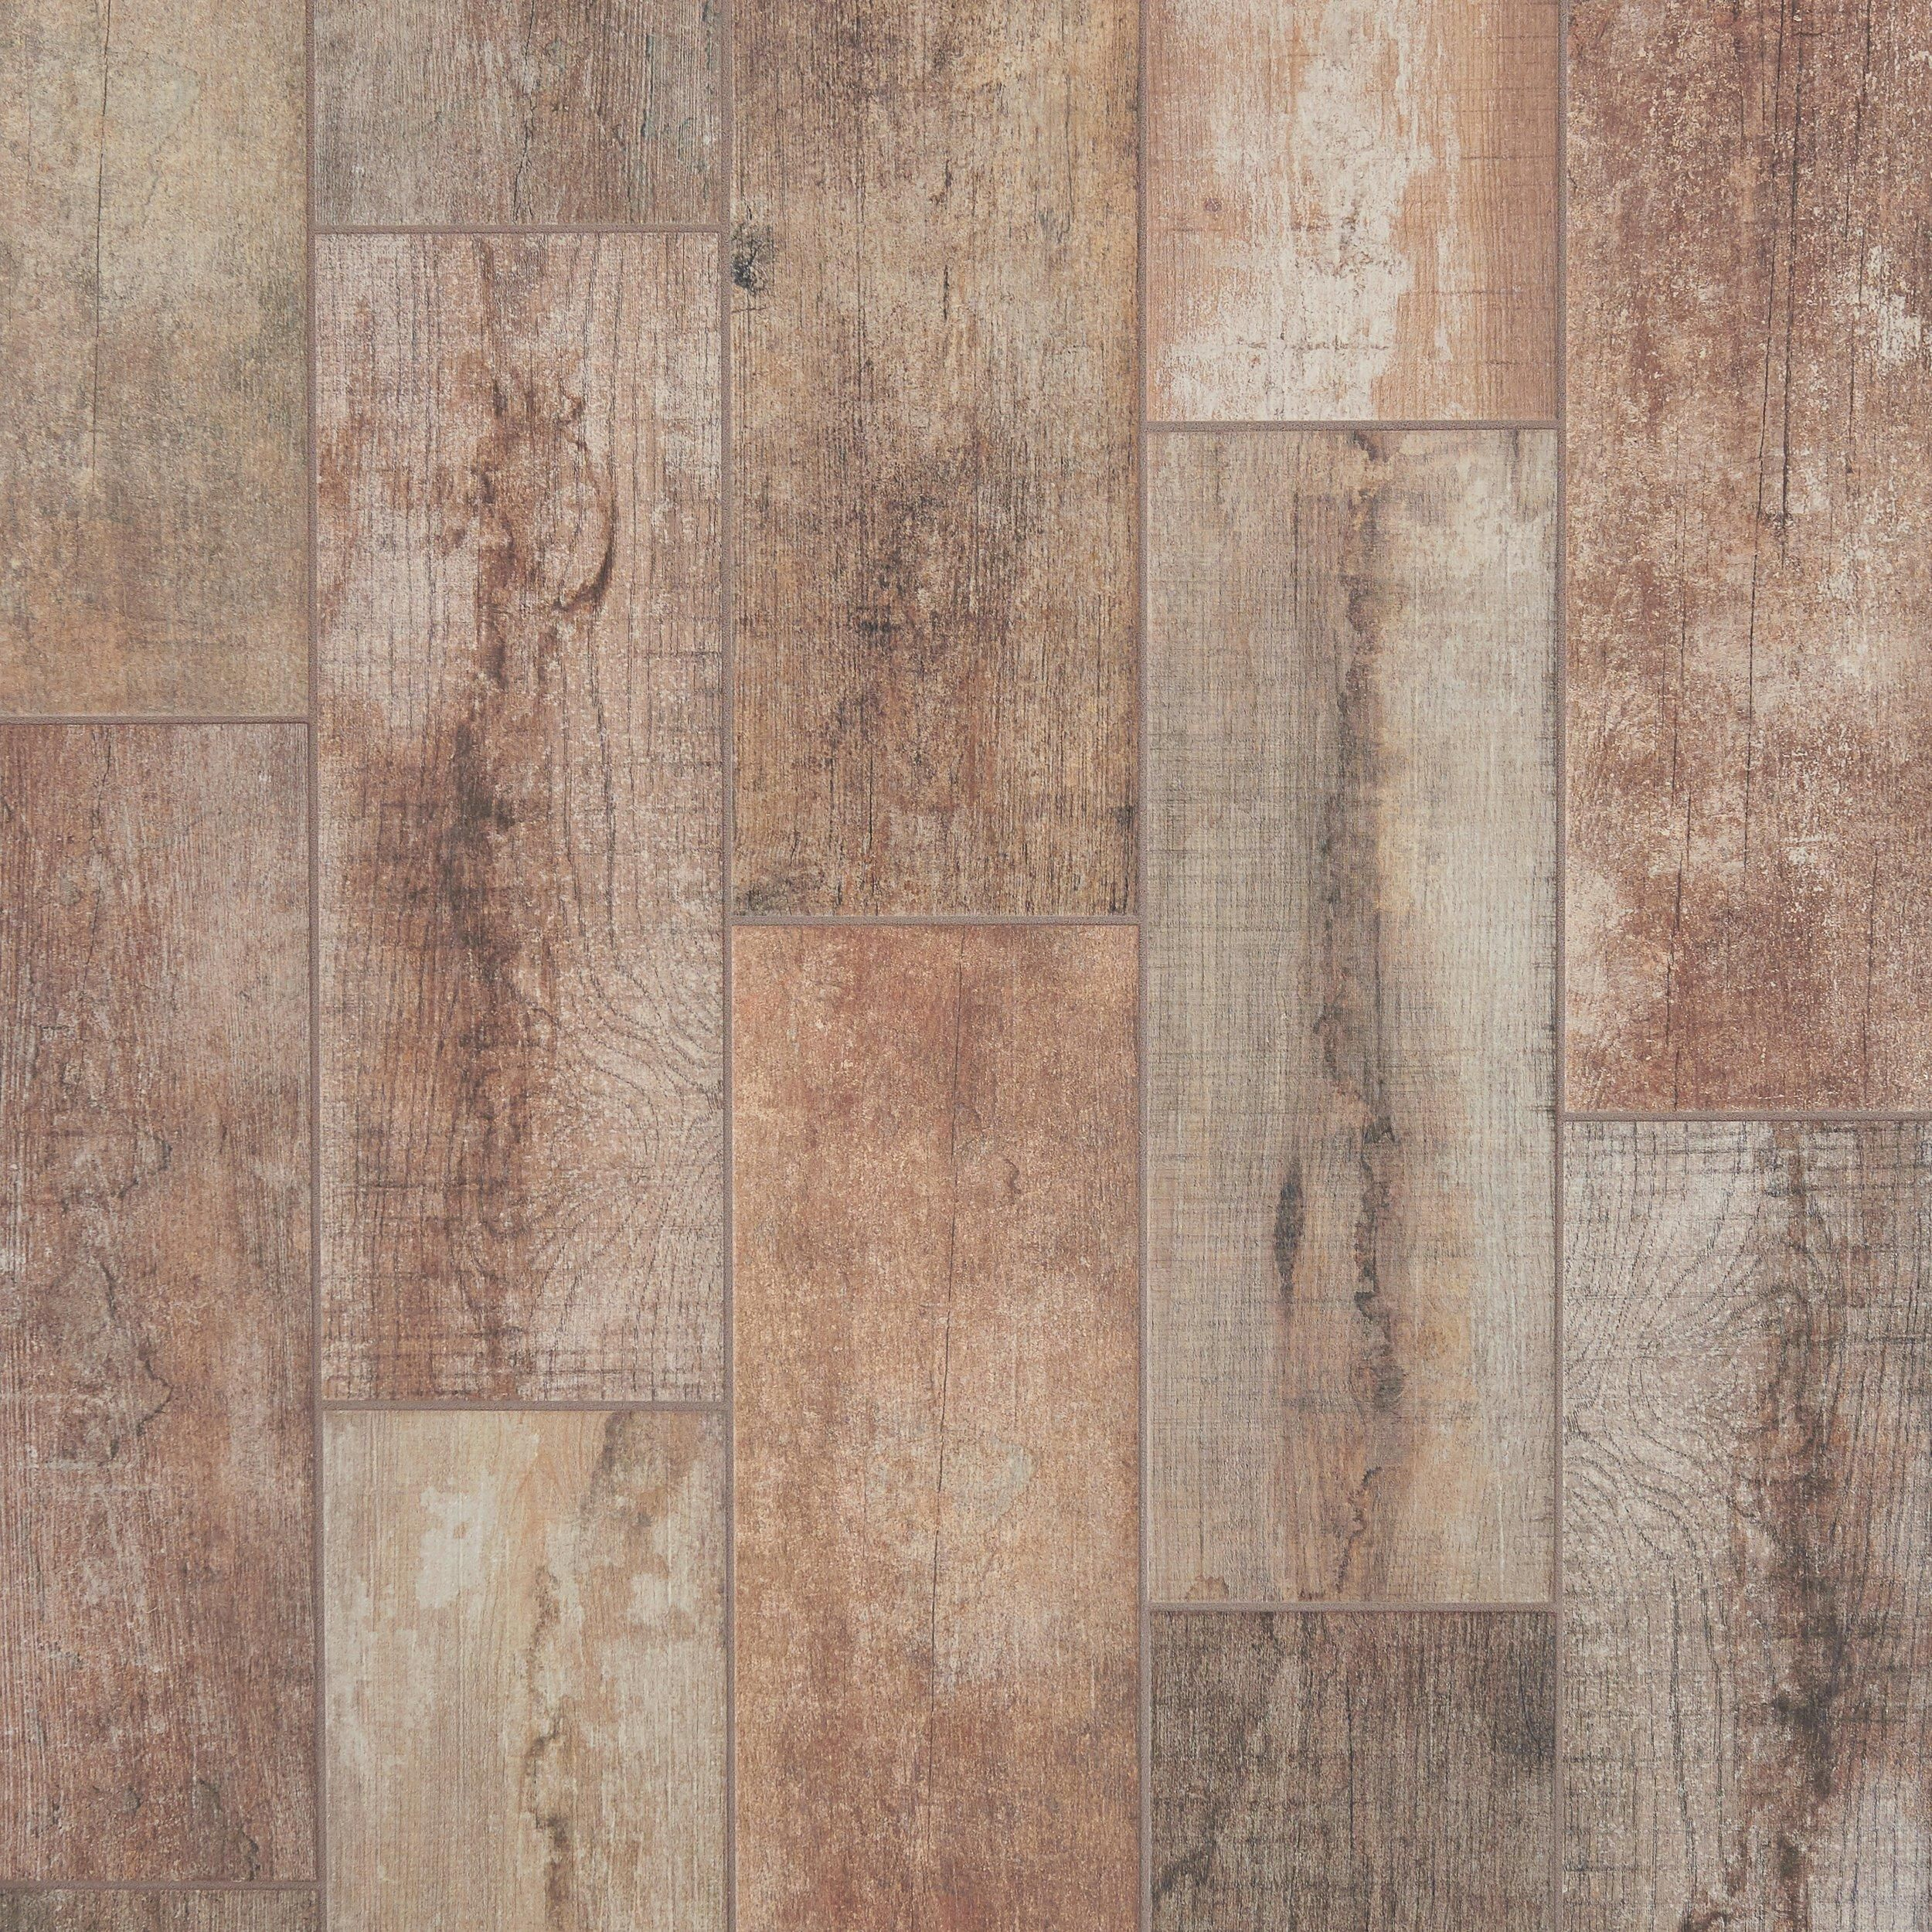 Julyo Wood Plank Ceramic Tile Products Pinterest Tiles